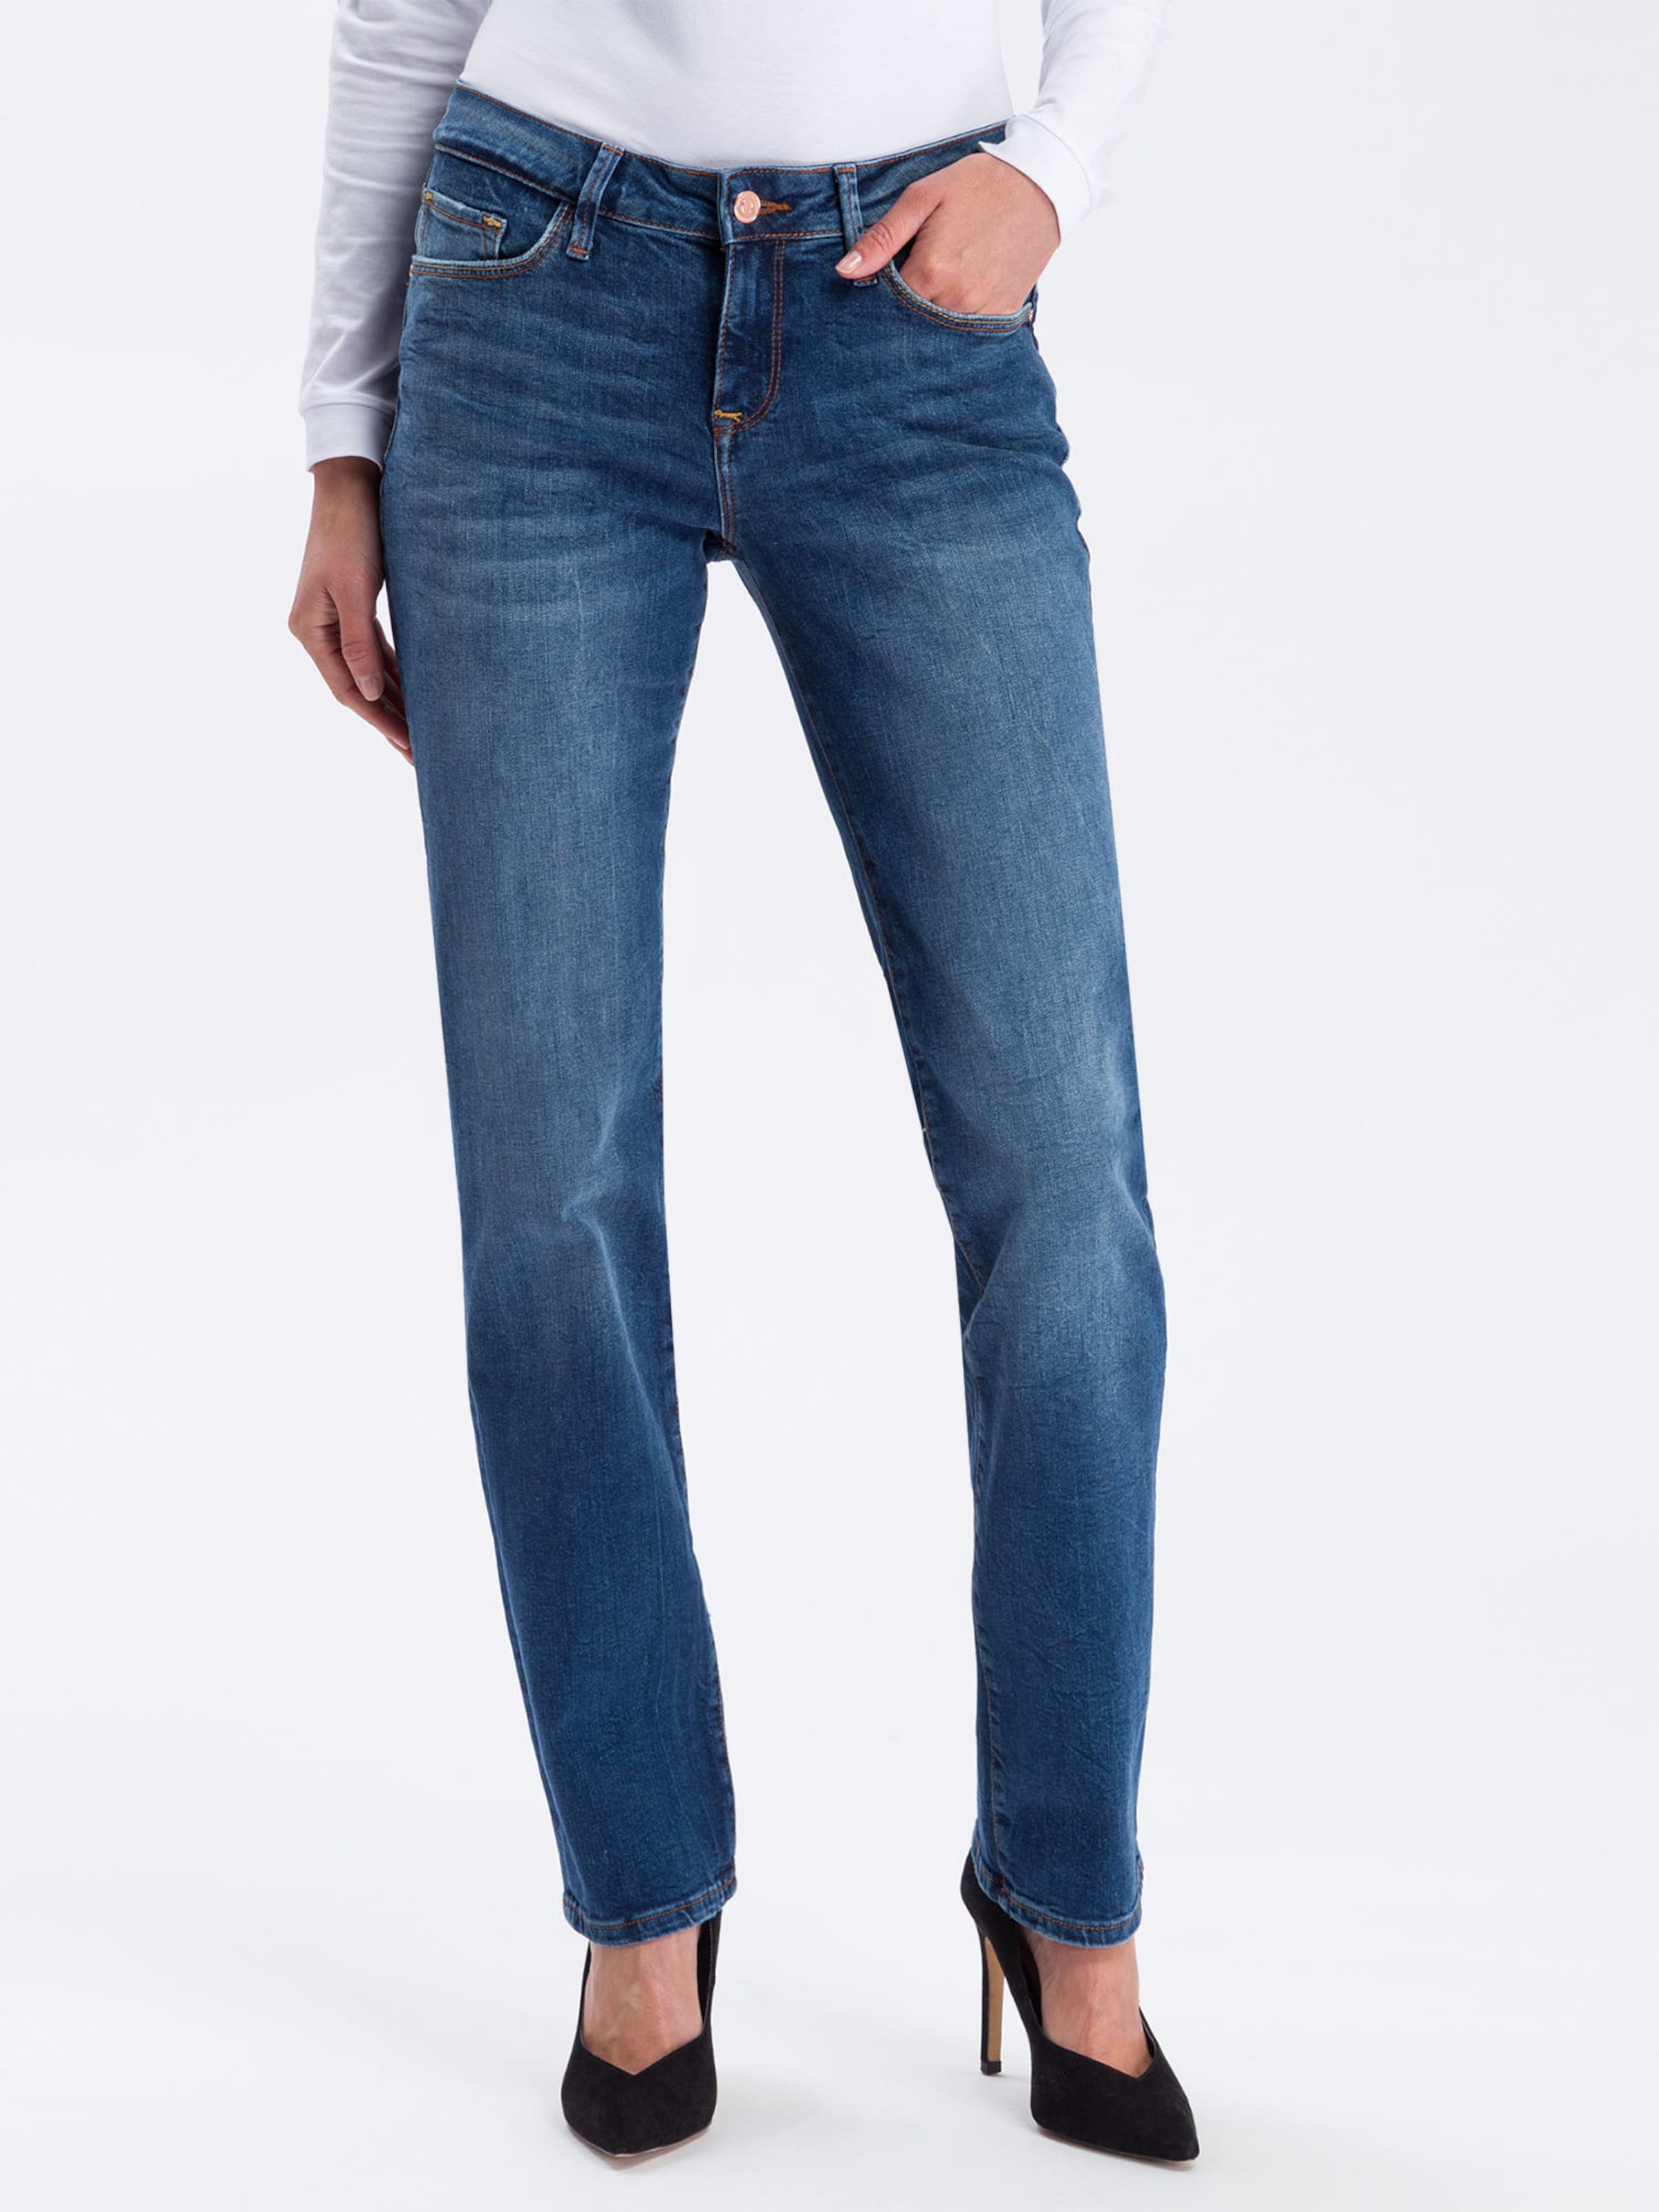 Blau Cross In Jeans Cross 'rose' BroeCdx